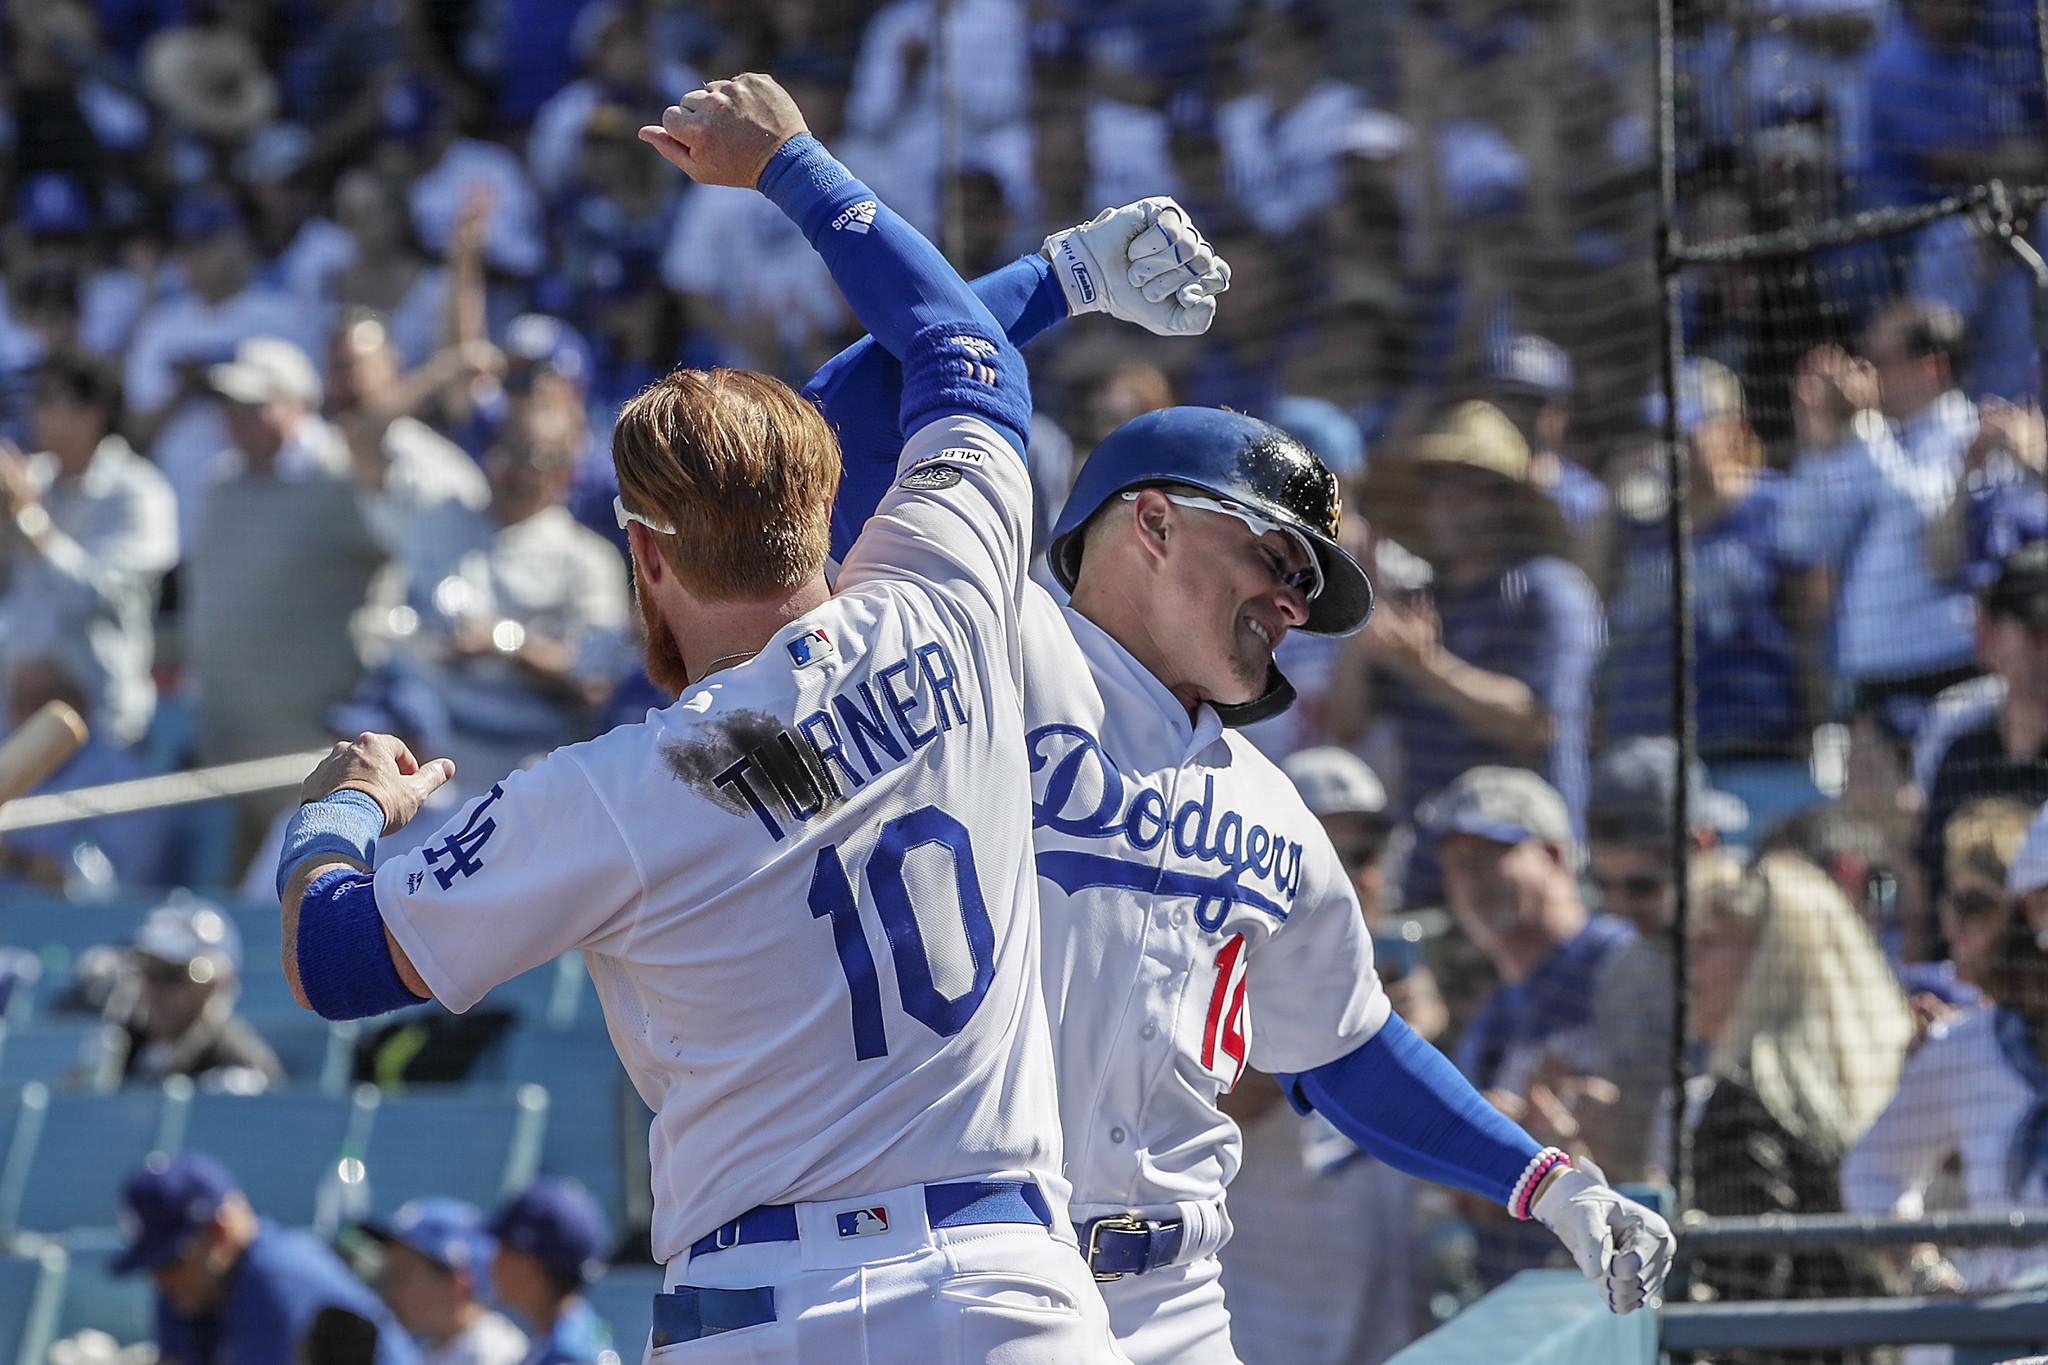 LOS ANGELES, CA, THURSDAY, MARCH 28, 2019 - Kiké Hernandez celebrates with Dodgers teammate Justin T